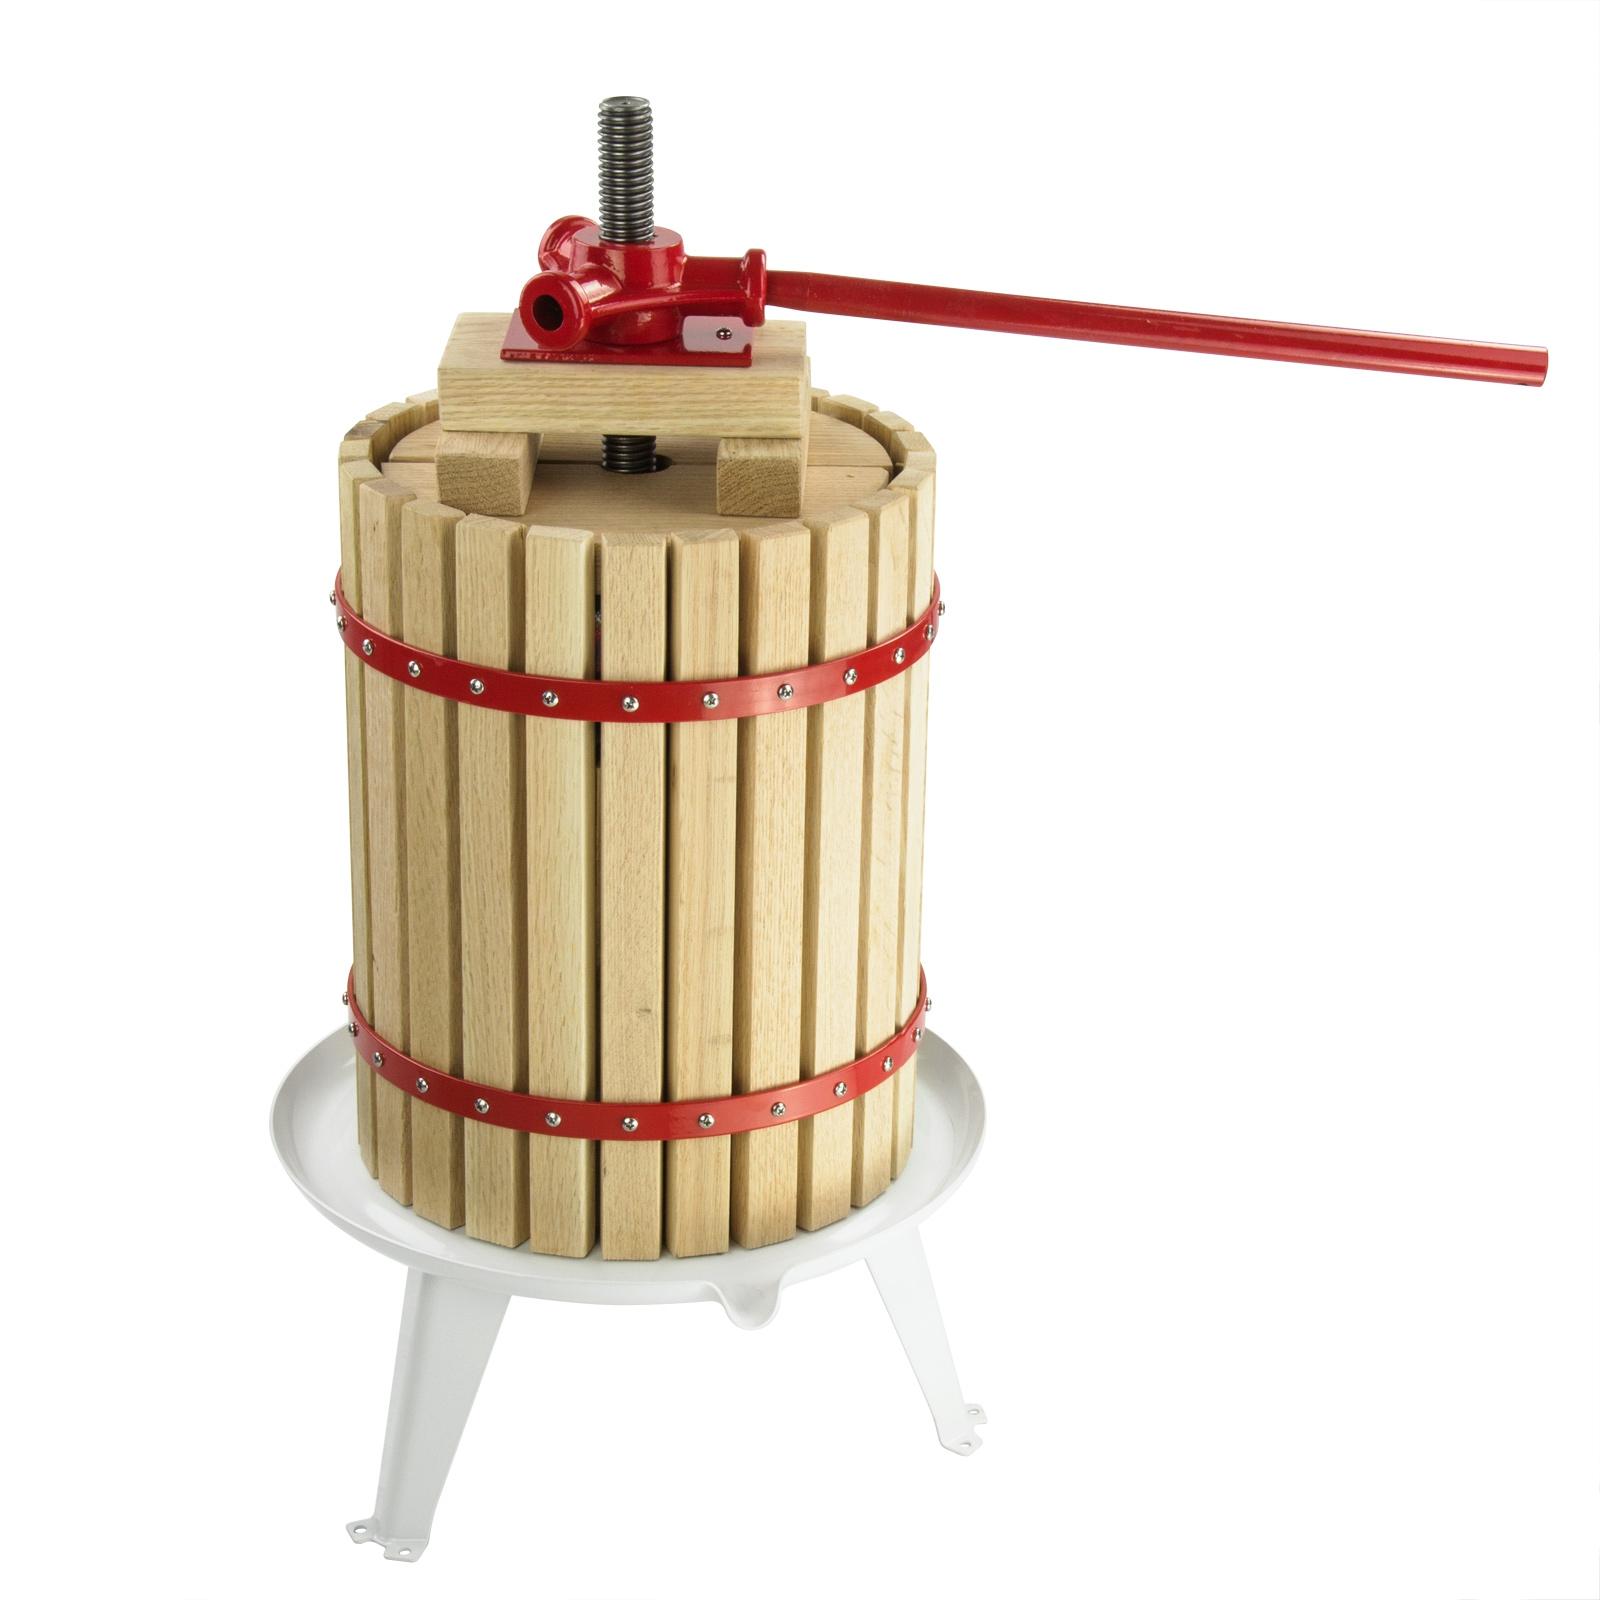 Dema Obstpresse Beerenpresse BP 6 / 12 / 18 Liter Saftpresse Weinpresse Preße Obst 30001